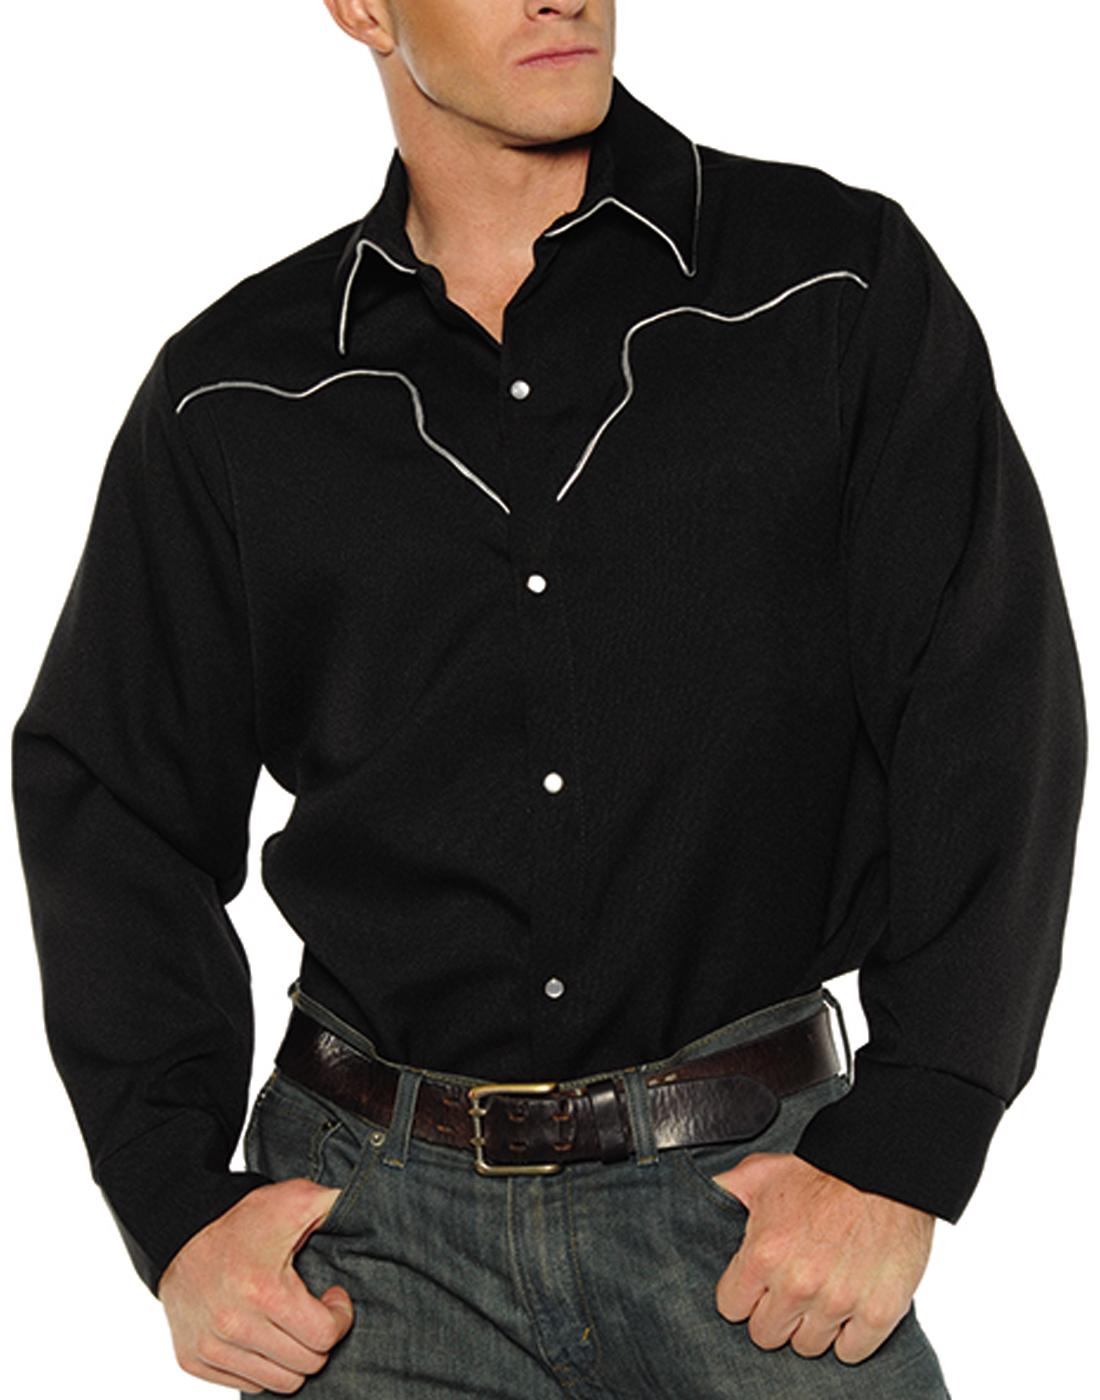 5a8a770c45e Details about Black Fancy Western Texan Rodeo Cowboy Adult Mens Costume  Shirt